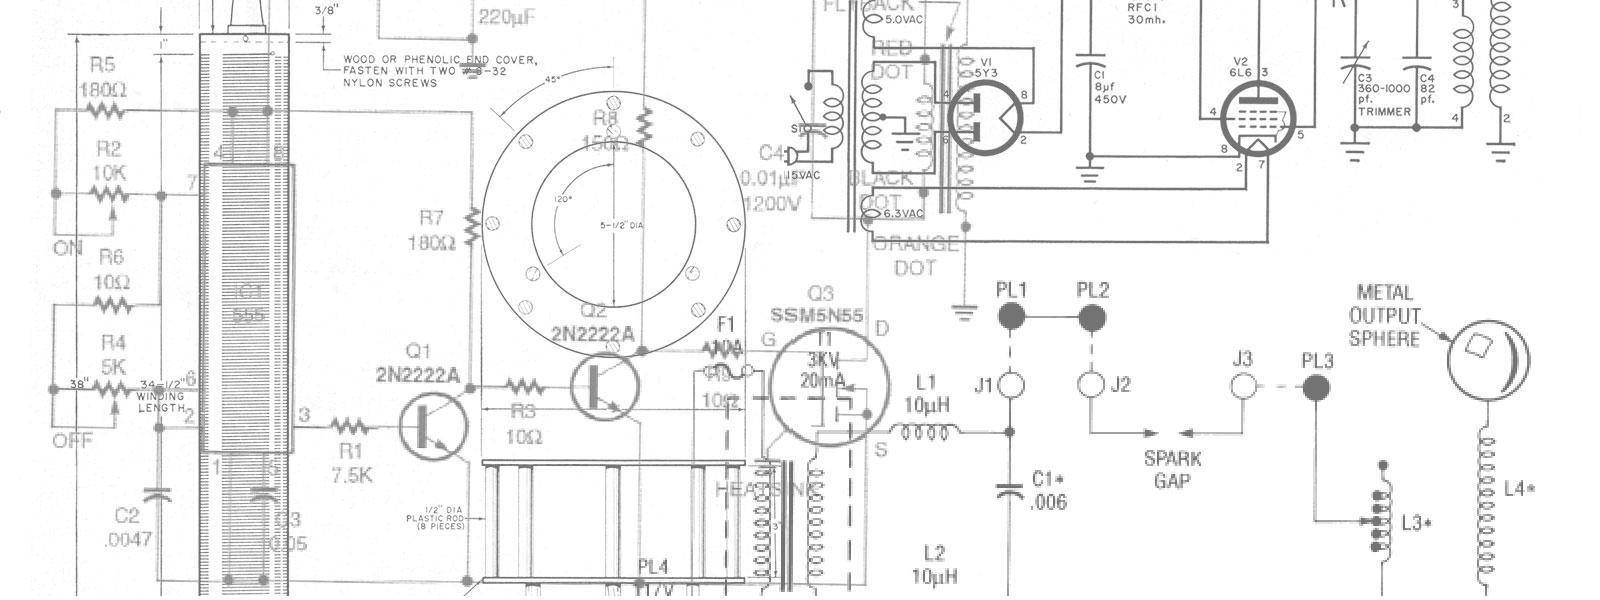 build a solid state tesla coil tesla universe solid state tesla coil or high voltage generator circuit diagram [ 1600 x 600 Pixel ]